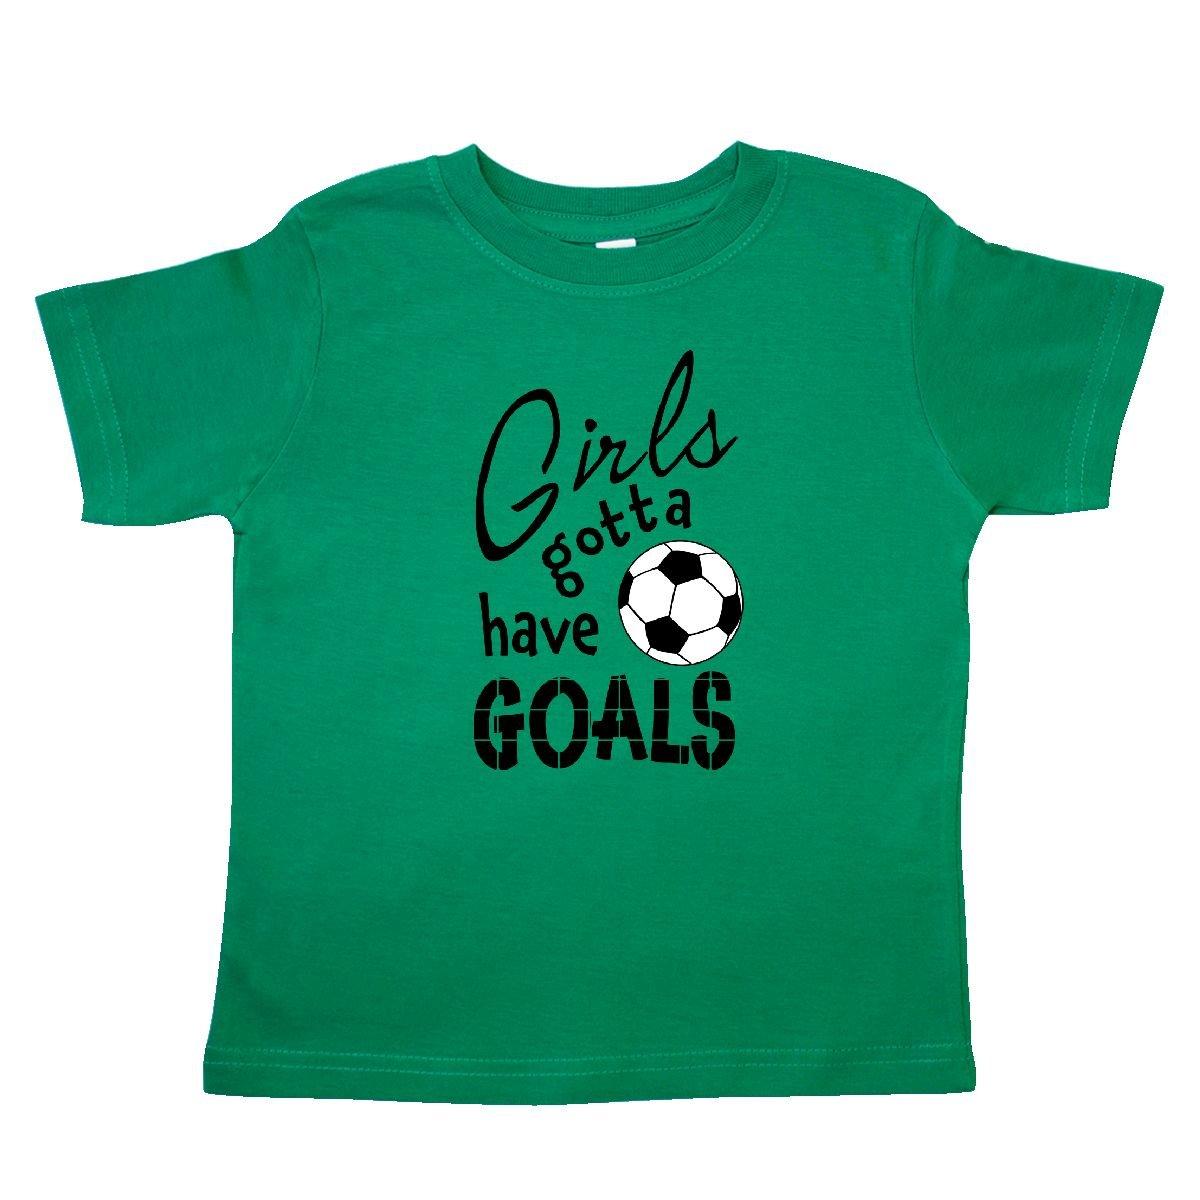 inktastic Girls Gotta Have Goals Soccer Toddler T-Shirt